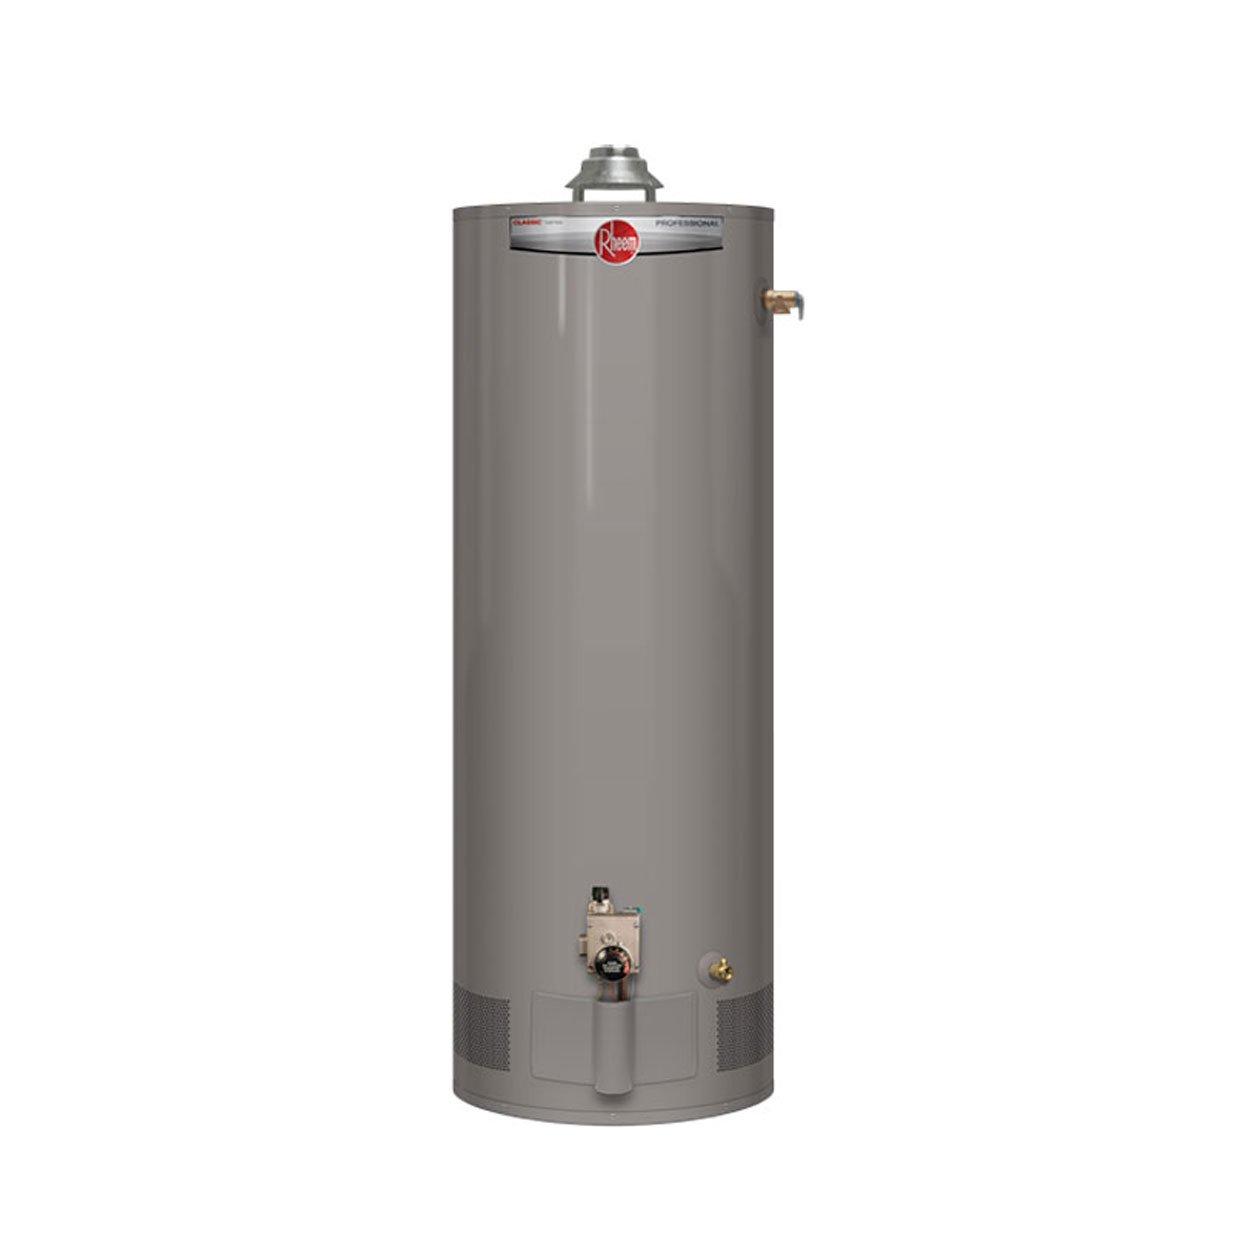 Rheem PROG40-38N RH59 Professional Classic Tall Residential 38K BTU Atmospheric Natural Gas Water Heater